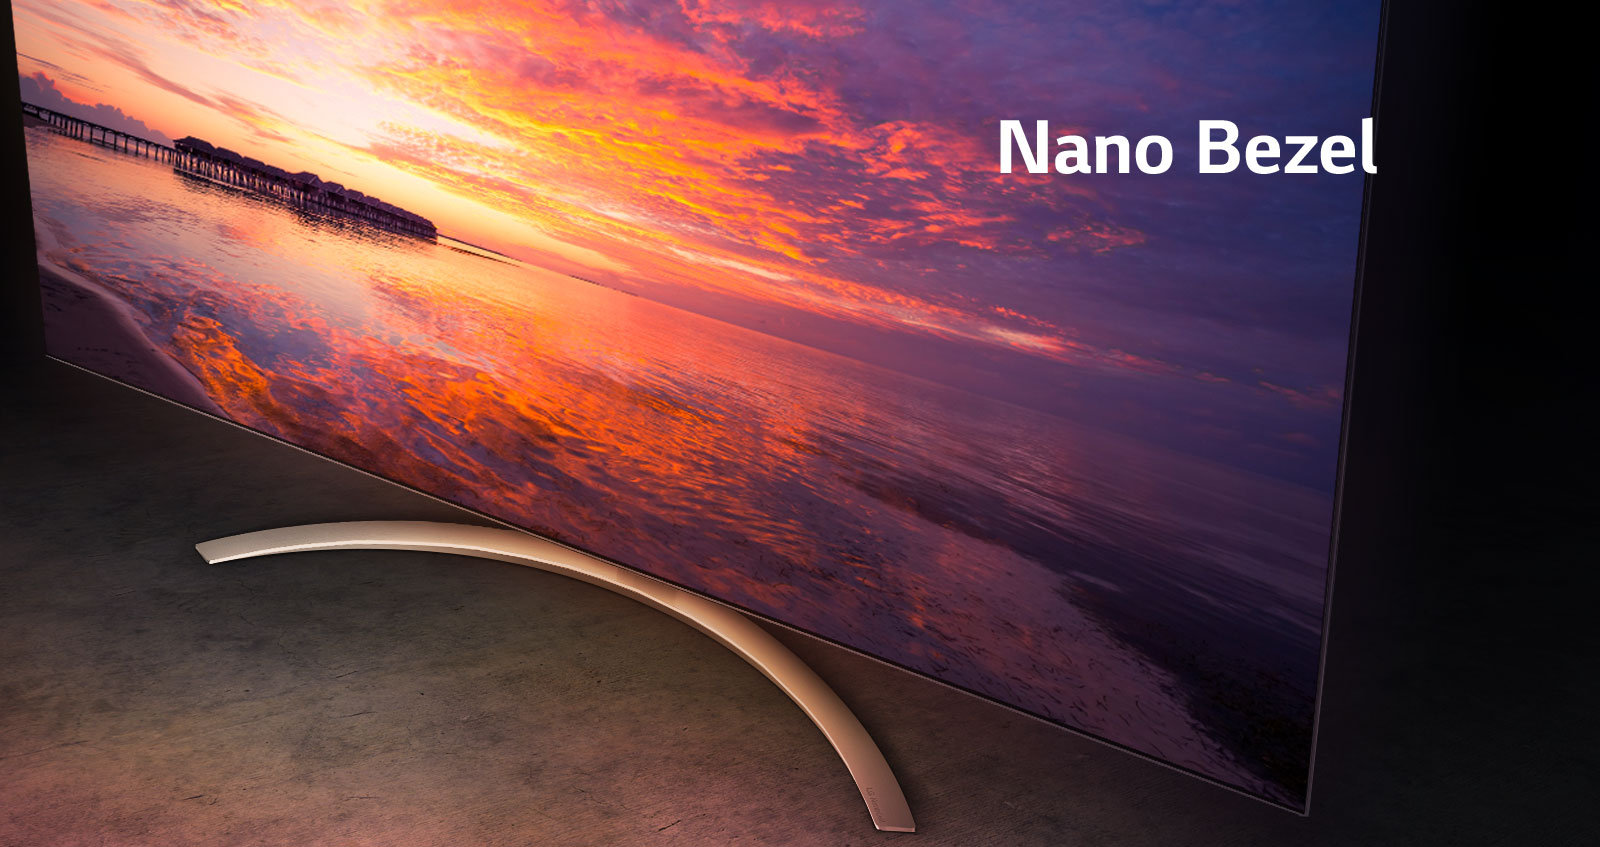 TV-NanoCell-SM86-09-Nano-Bezel-Desktop_V01.jpg